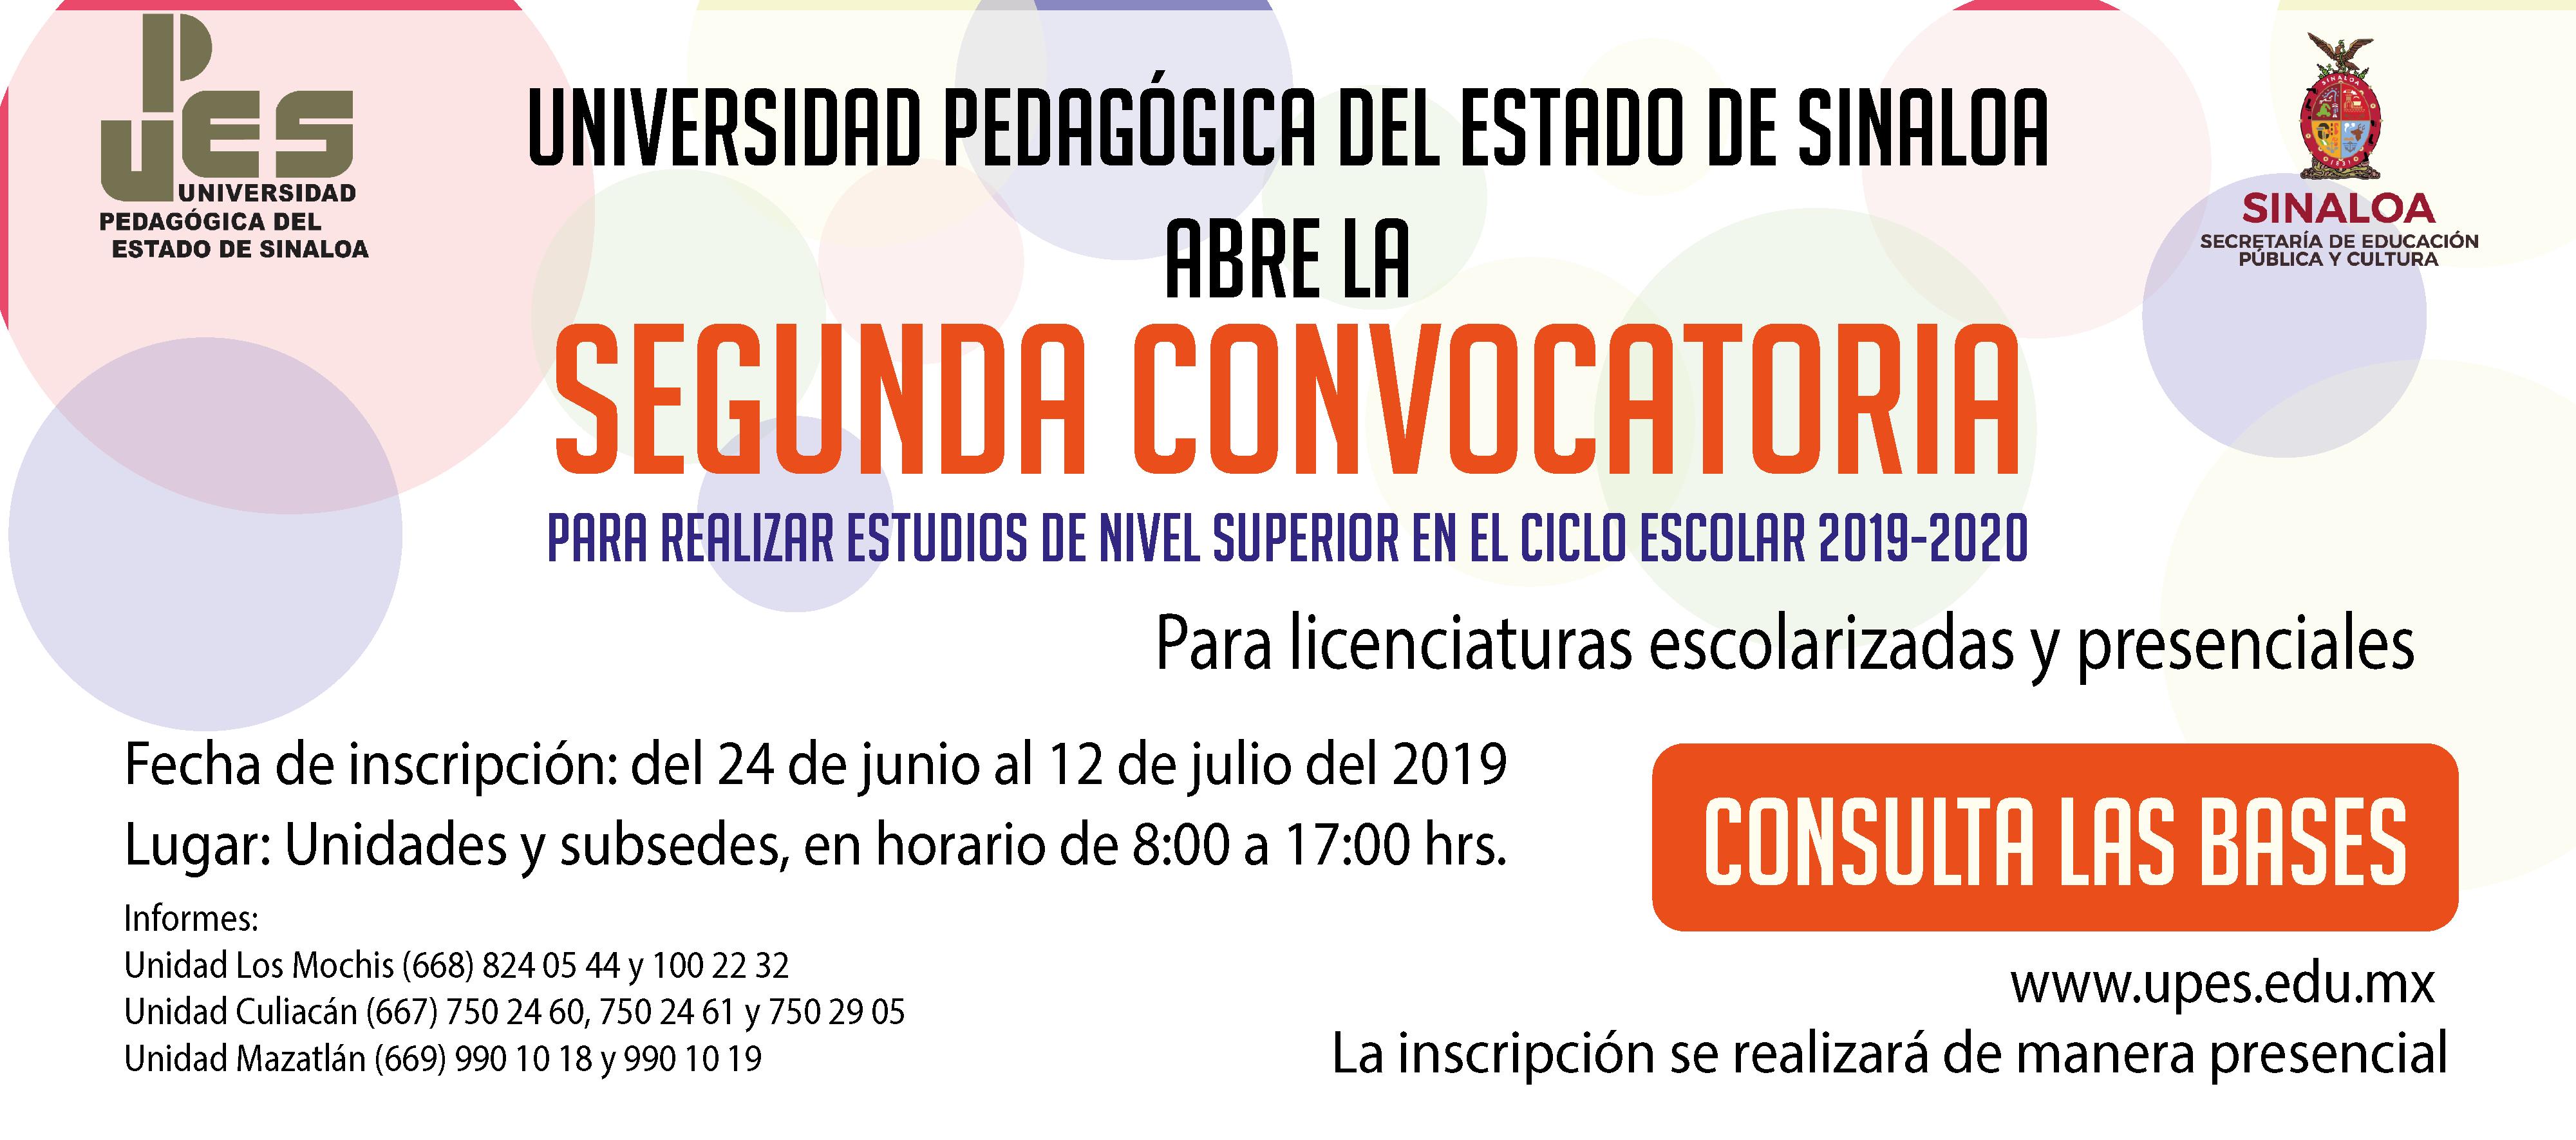 Segunda-Convocatoria-al-proceso-de-inscripcion-para-realizar-estudios-de-nivel-superior-2019-2020-S